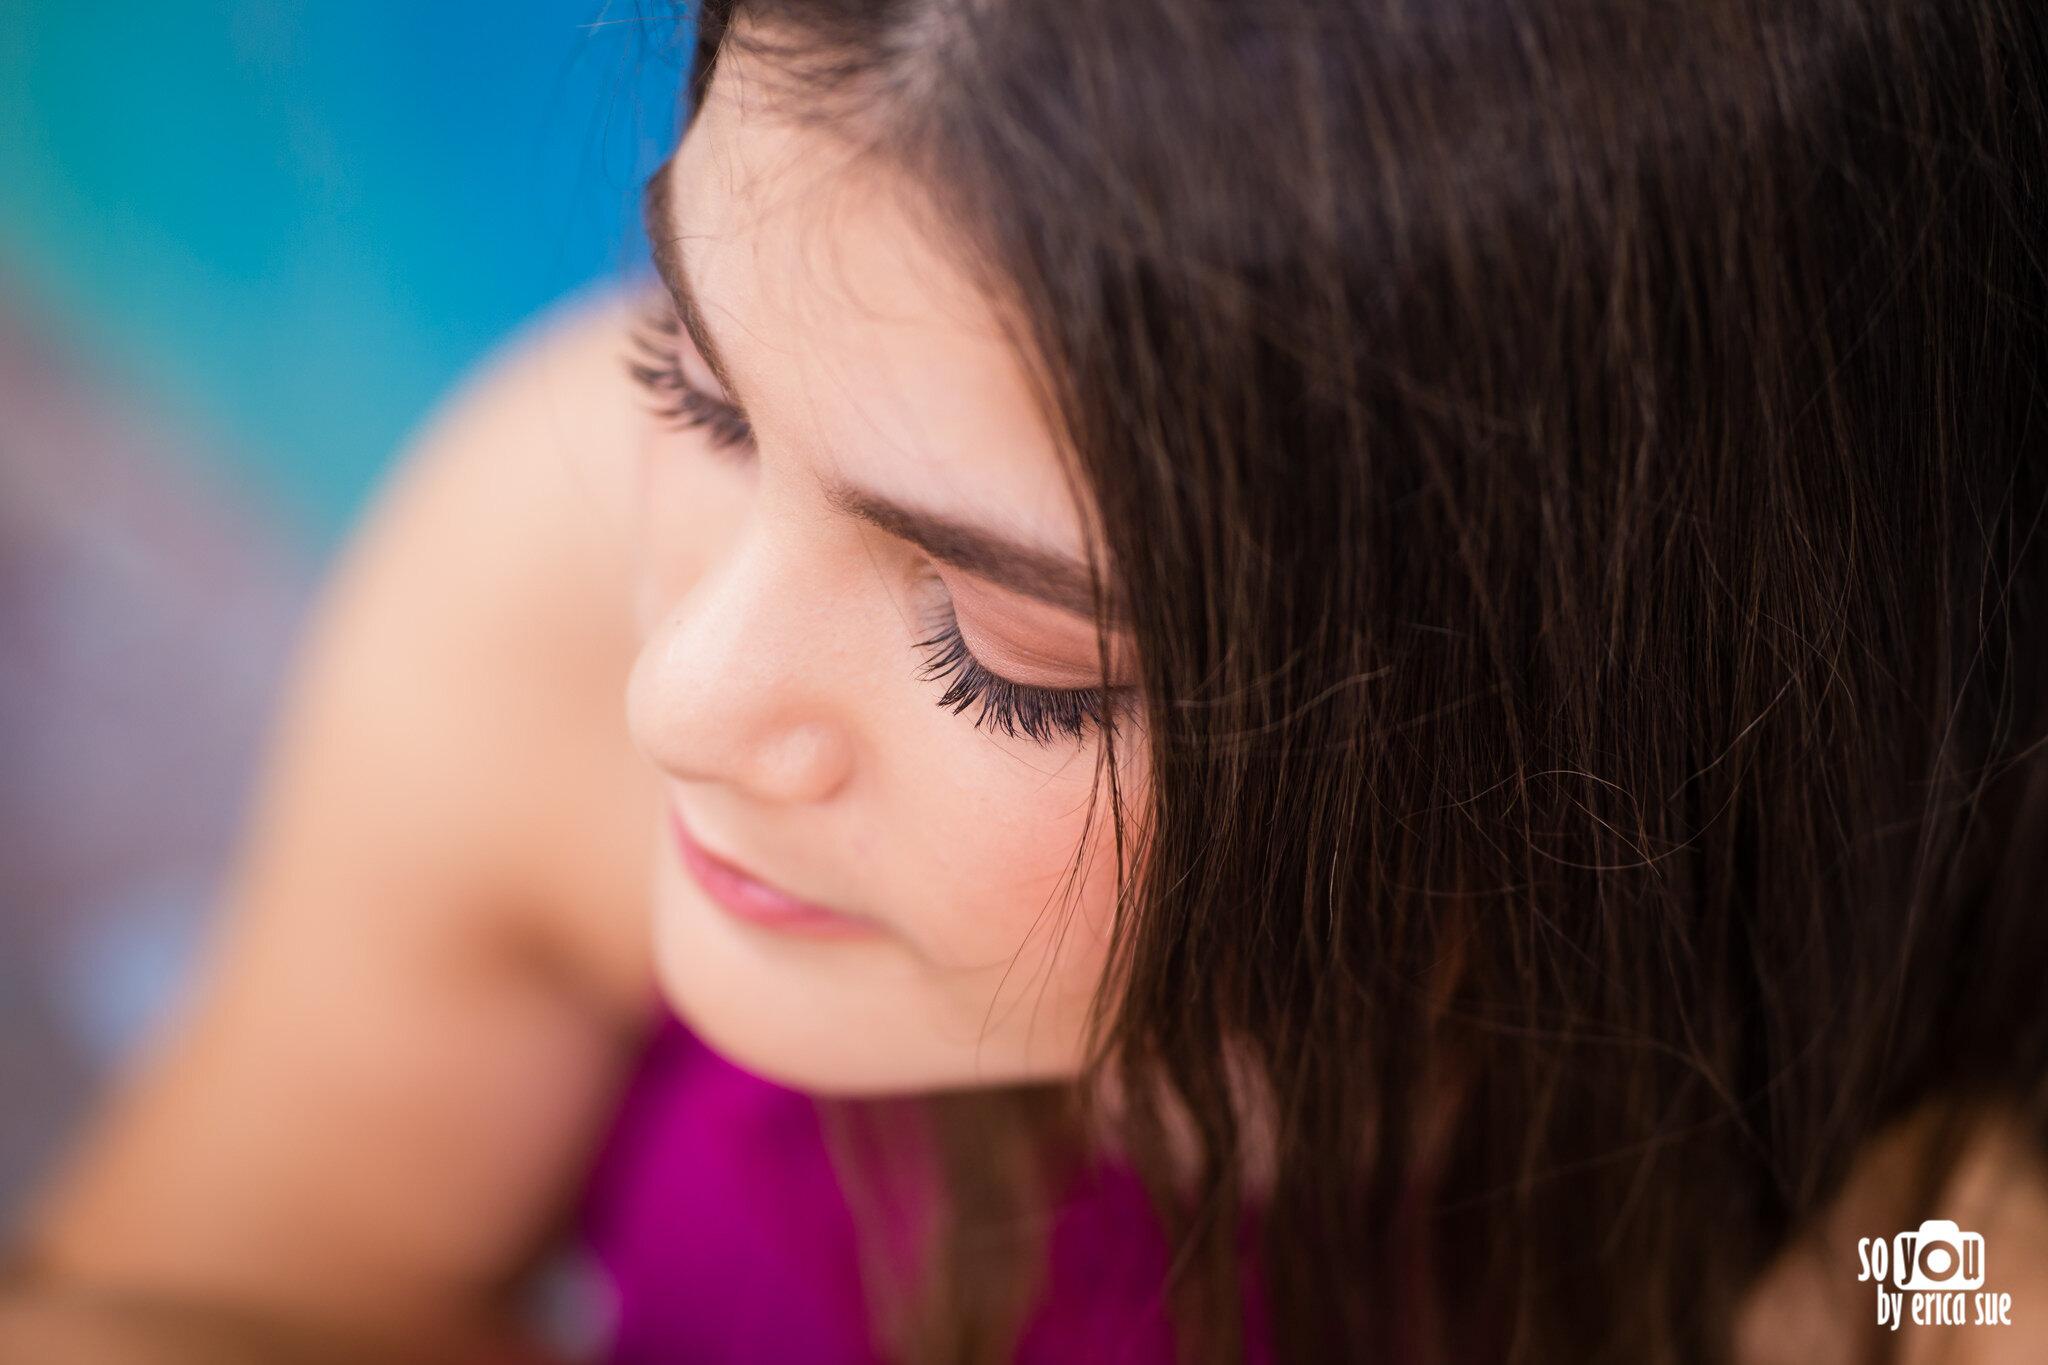 so-you-by-erica-sue-wynwood-miami-lifestyle-family-photographer-mitzvah-pre-shoot-0177.JPG